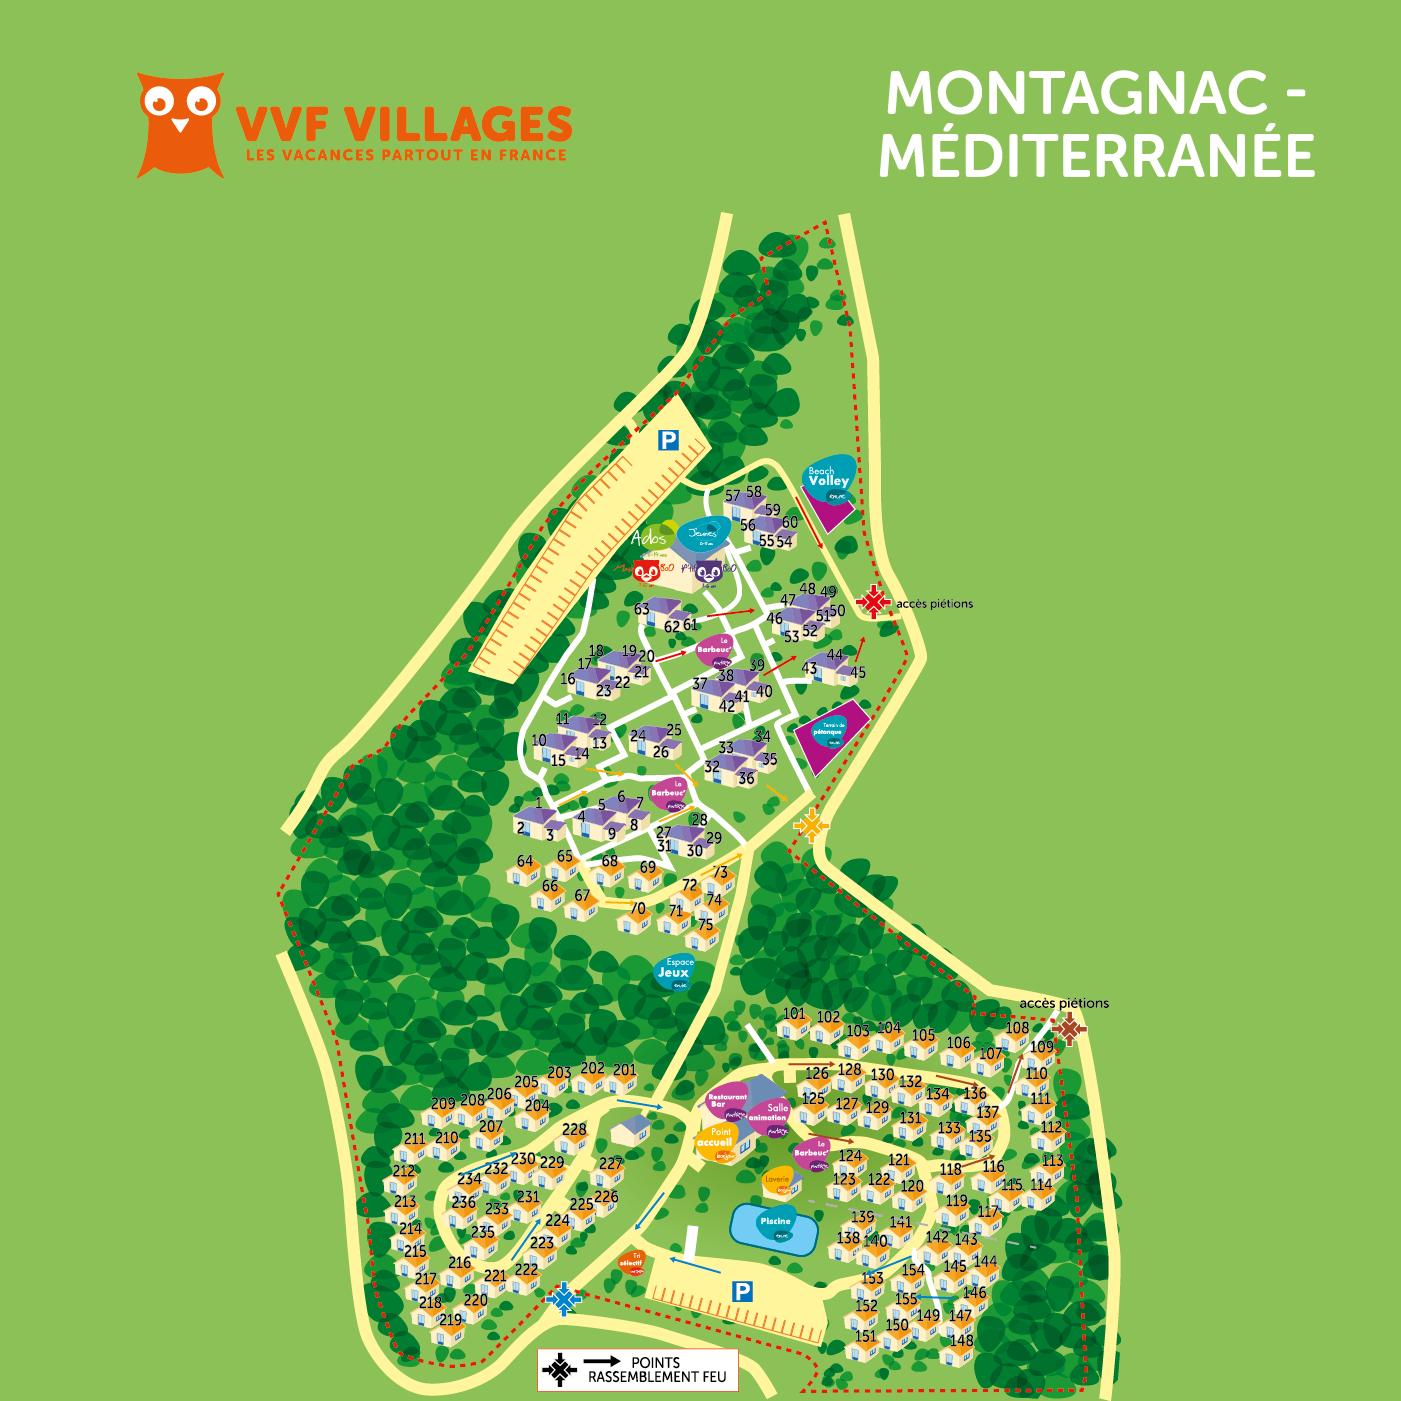 Plan du village de Montagnac-Mediterranée